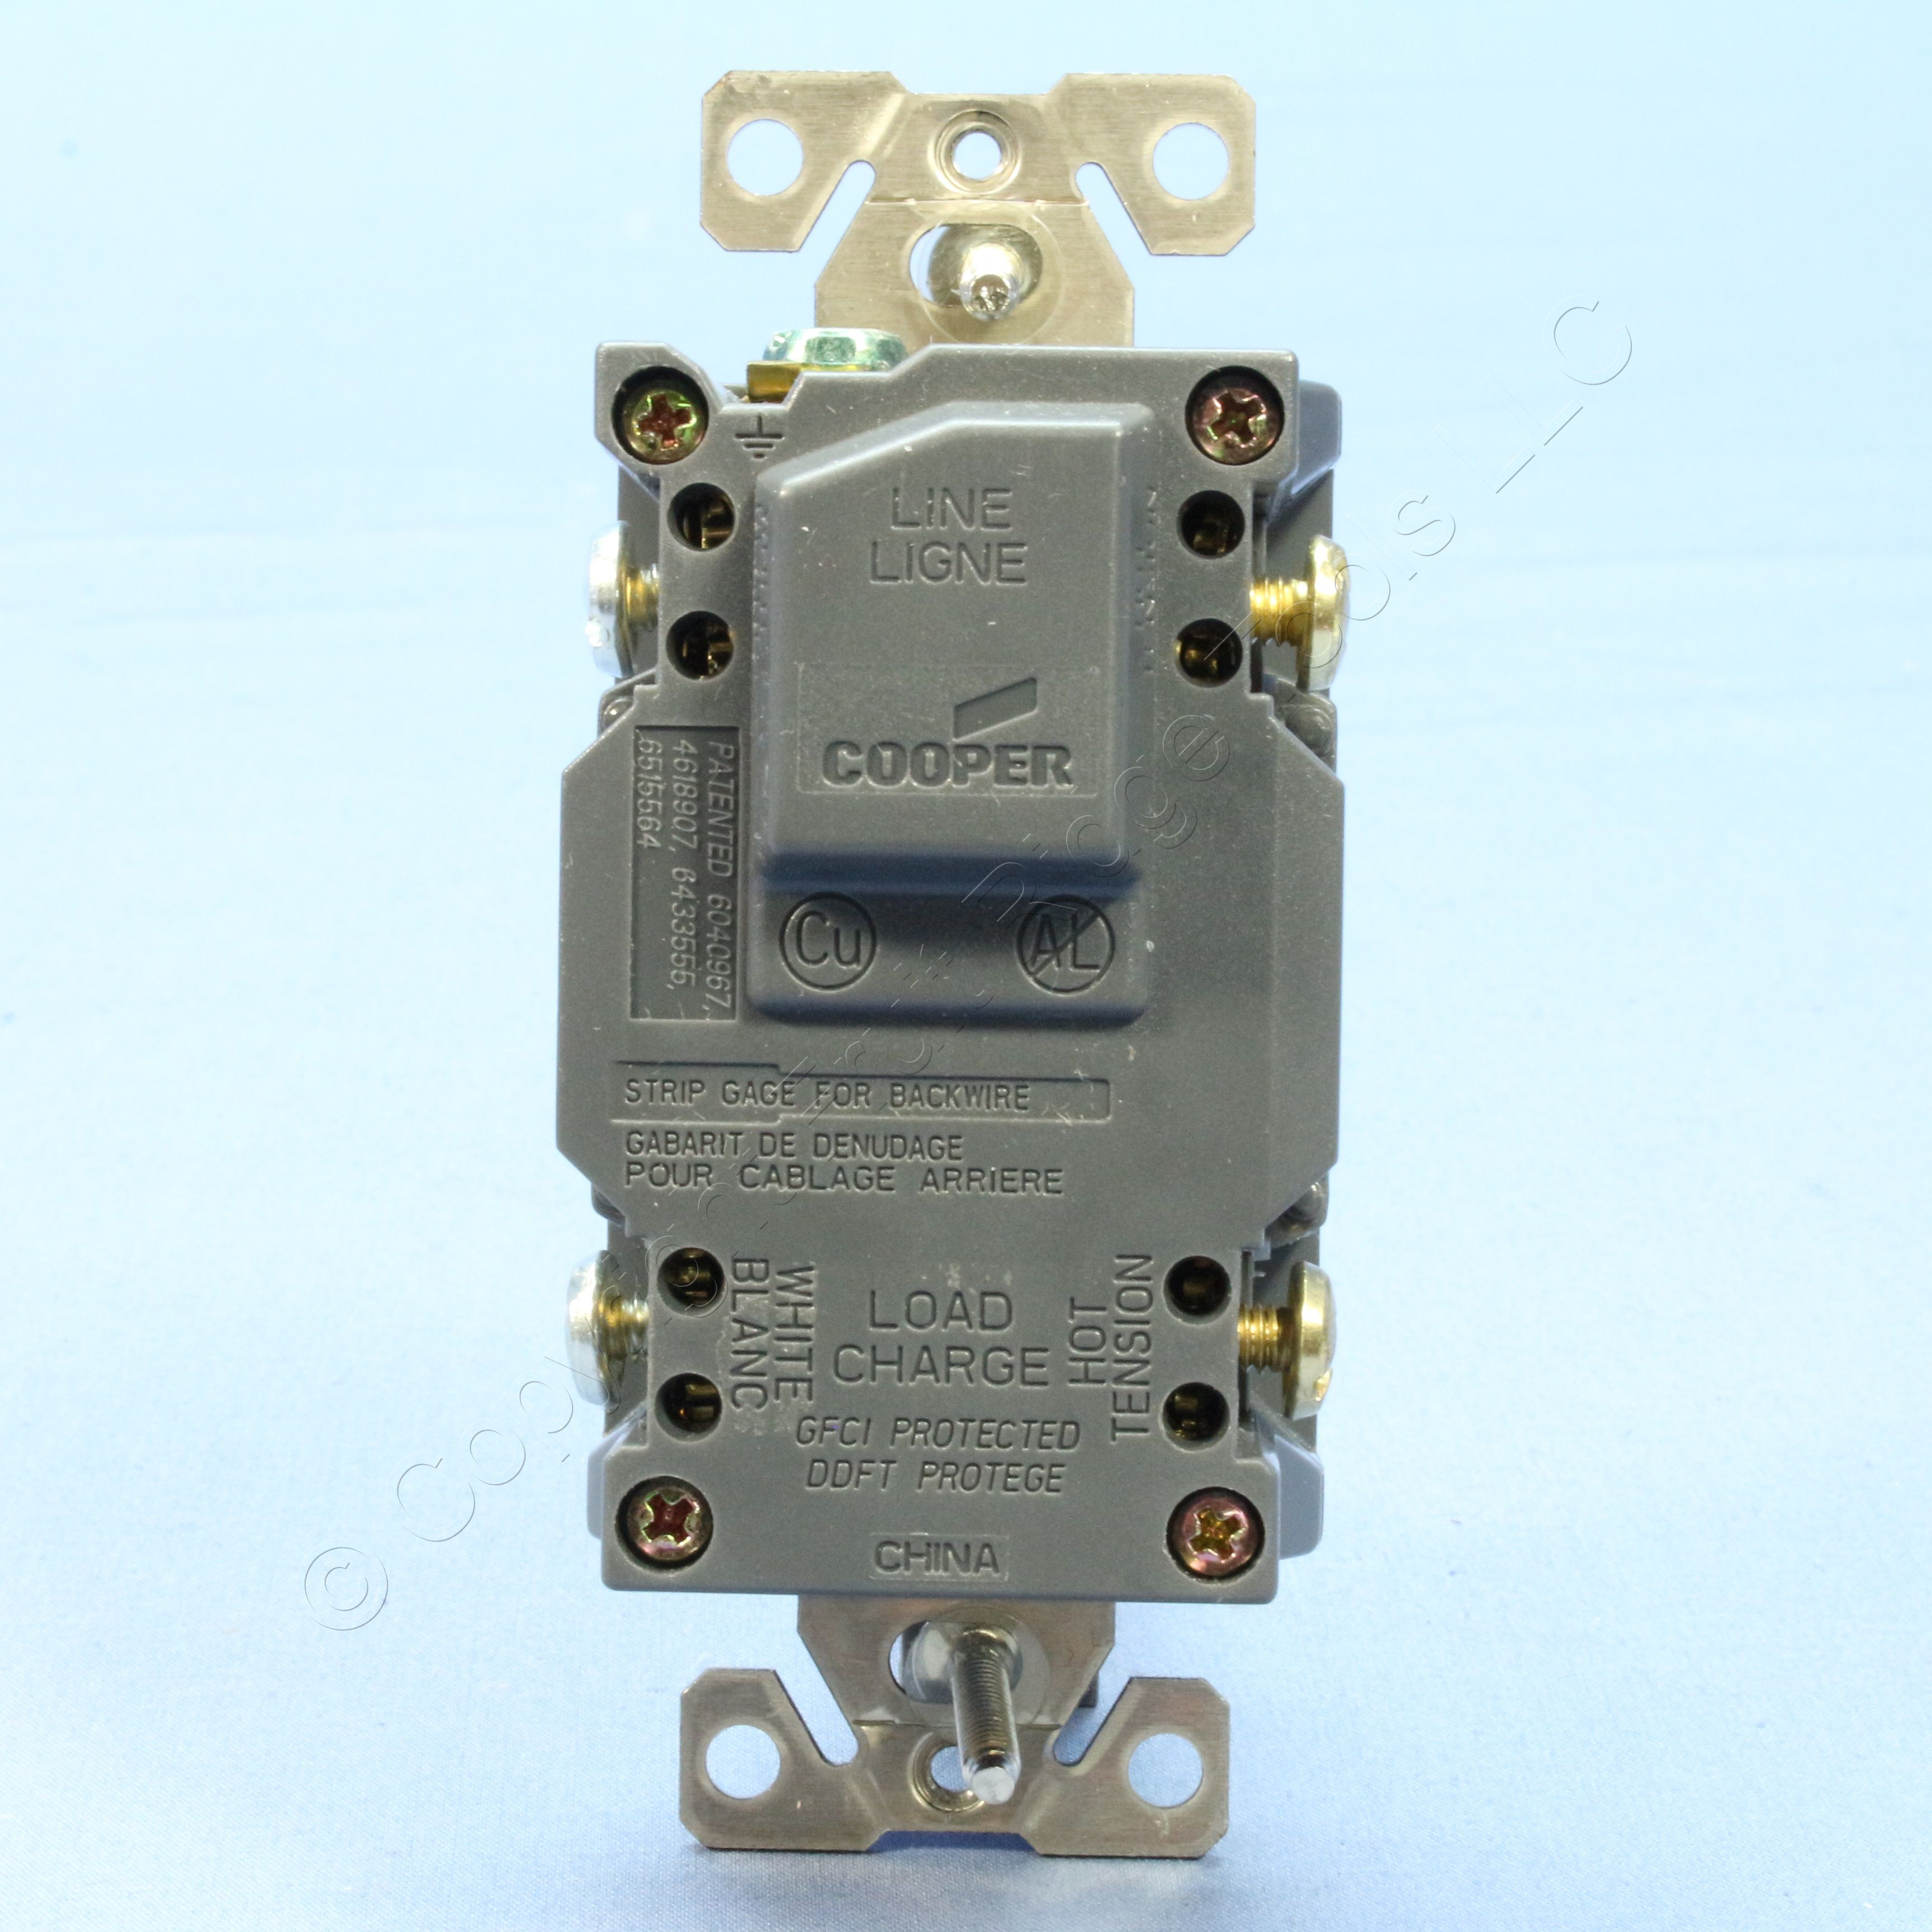 buy cooper aspire silver granite gfci receptacle duplex gfi outlet rh fruitridgetools com Cooper Wiring Devices Catalog cooper wiring devices catalog pdf